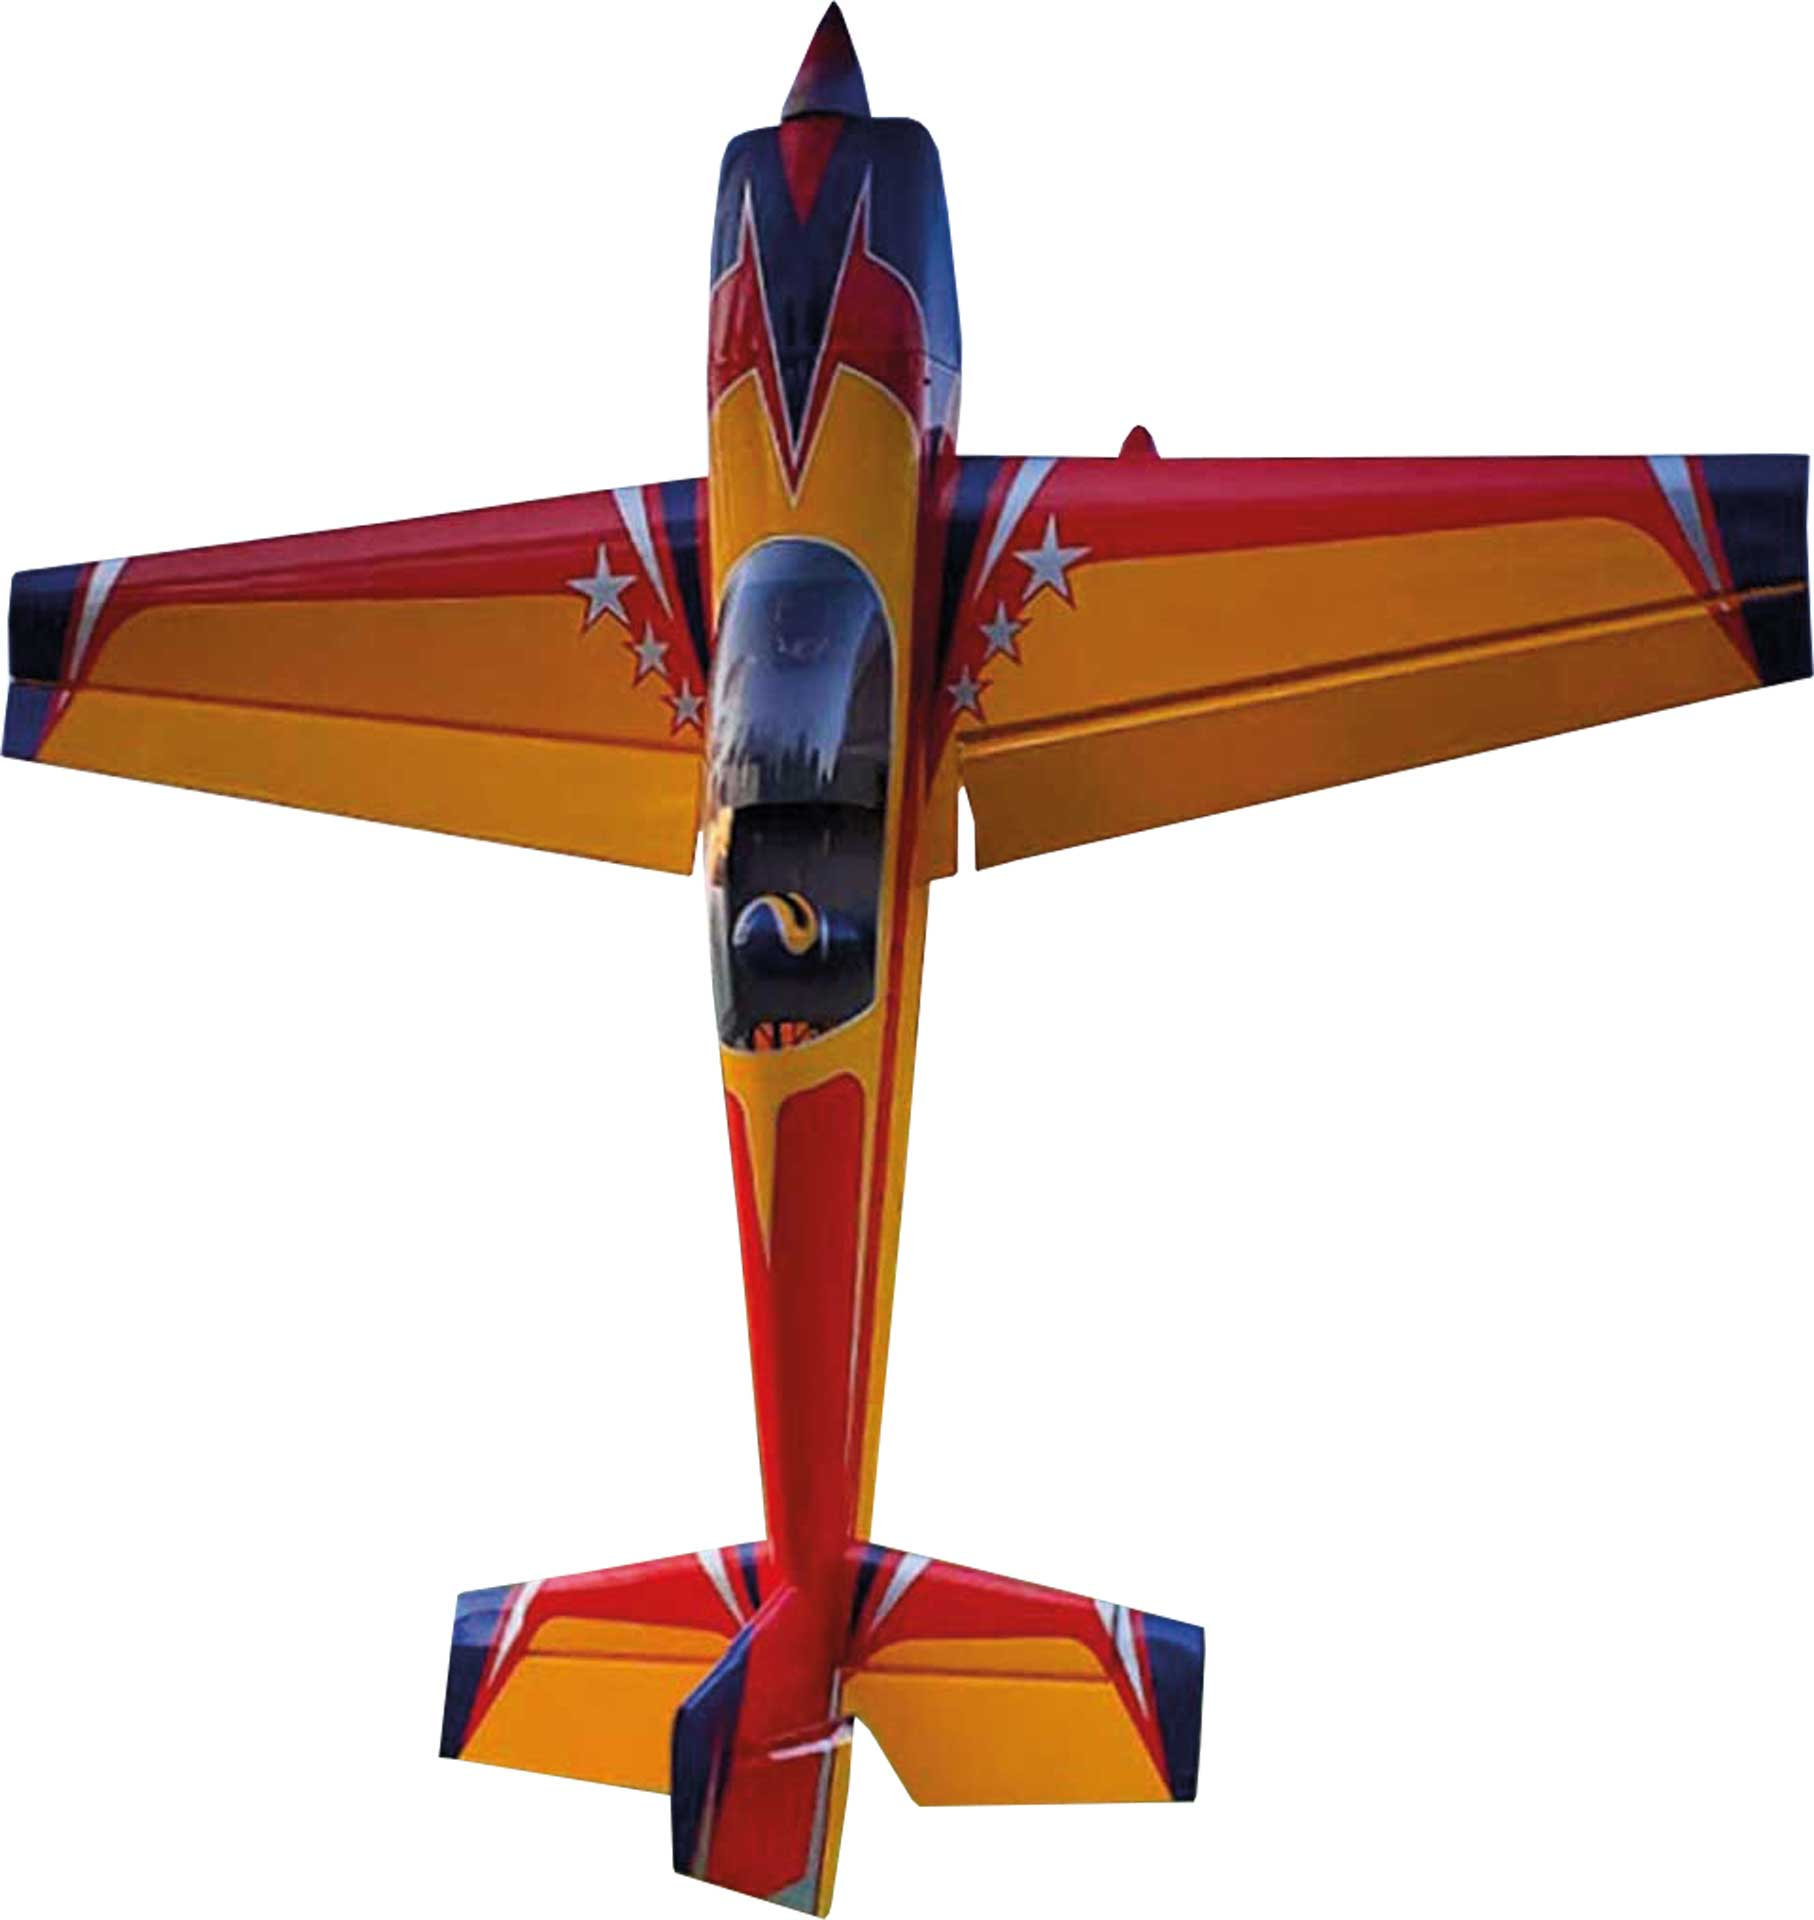 "EXTREMEFLIGHT-RC EXTRA 300 104"" ROT/GELB/BLAU"